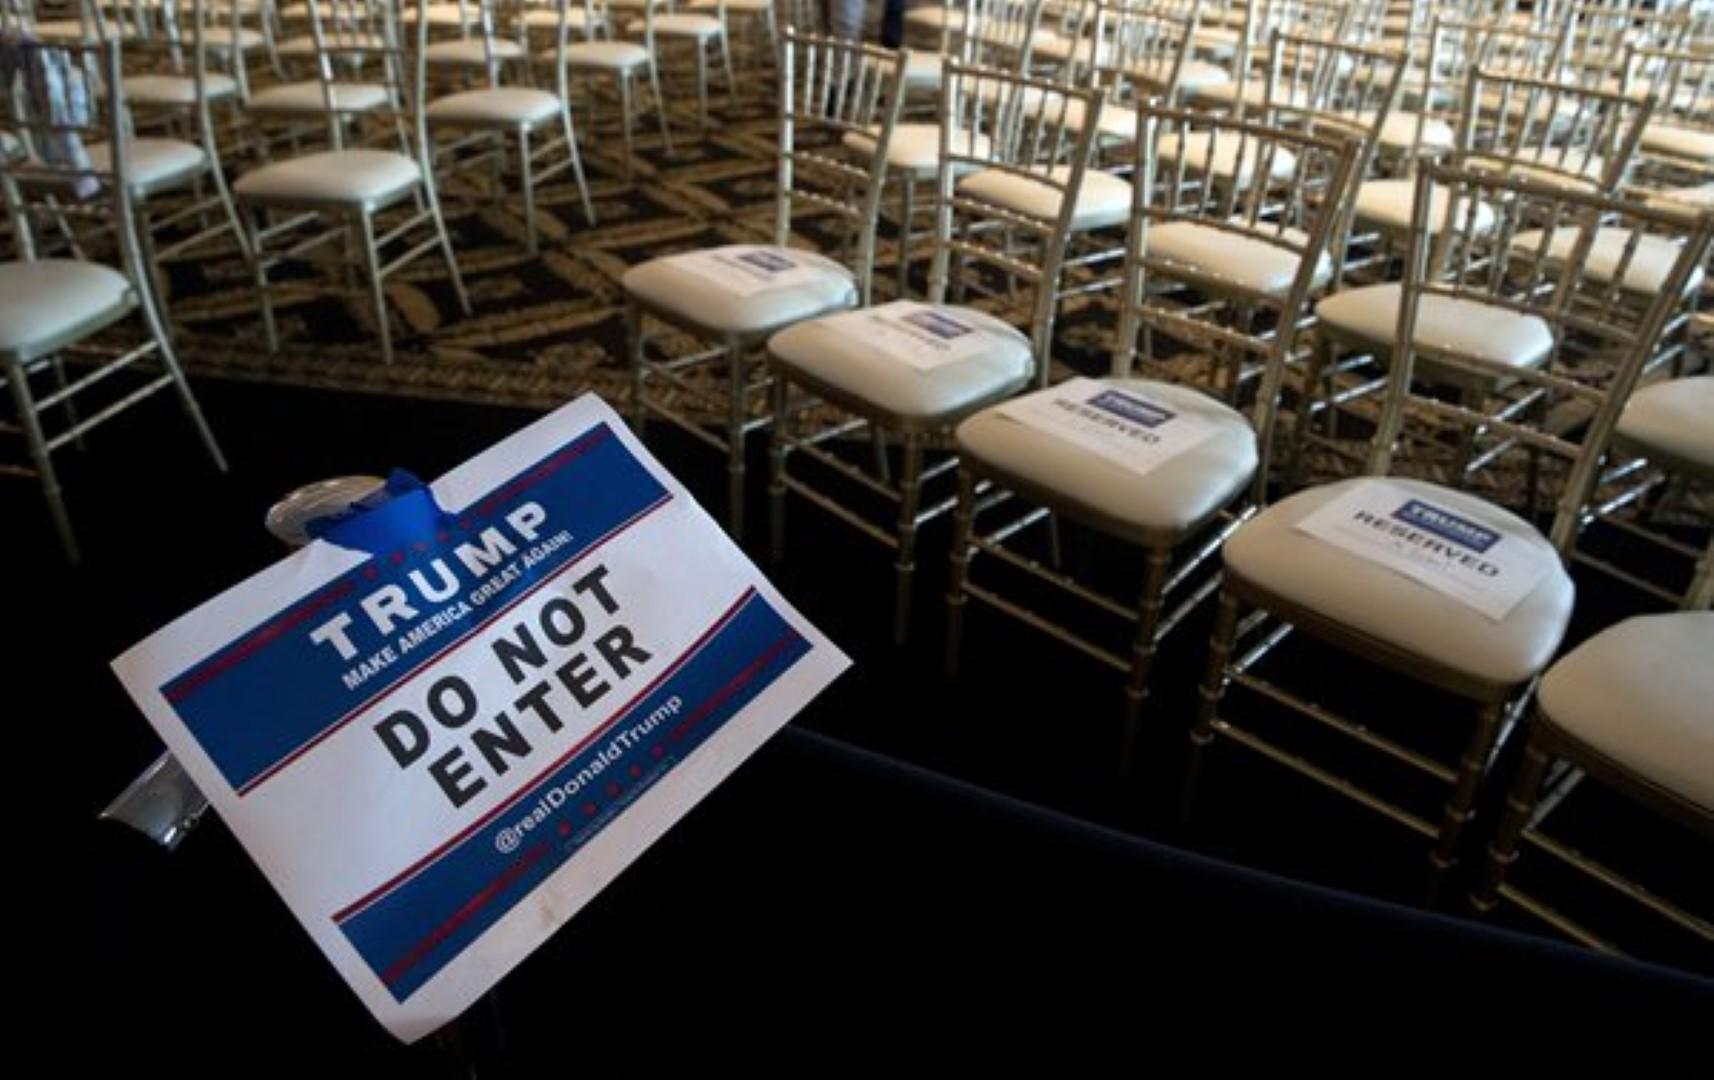 trump-rally-no-entry-Large.jpg